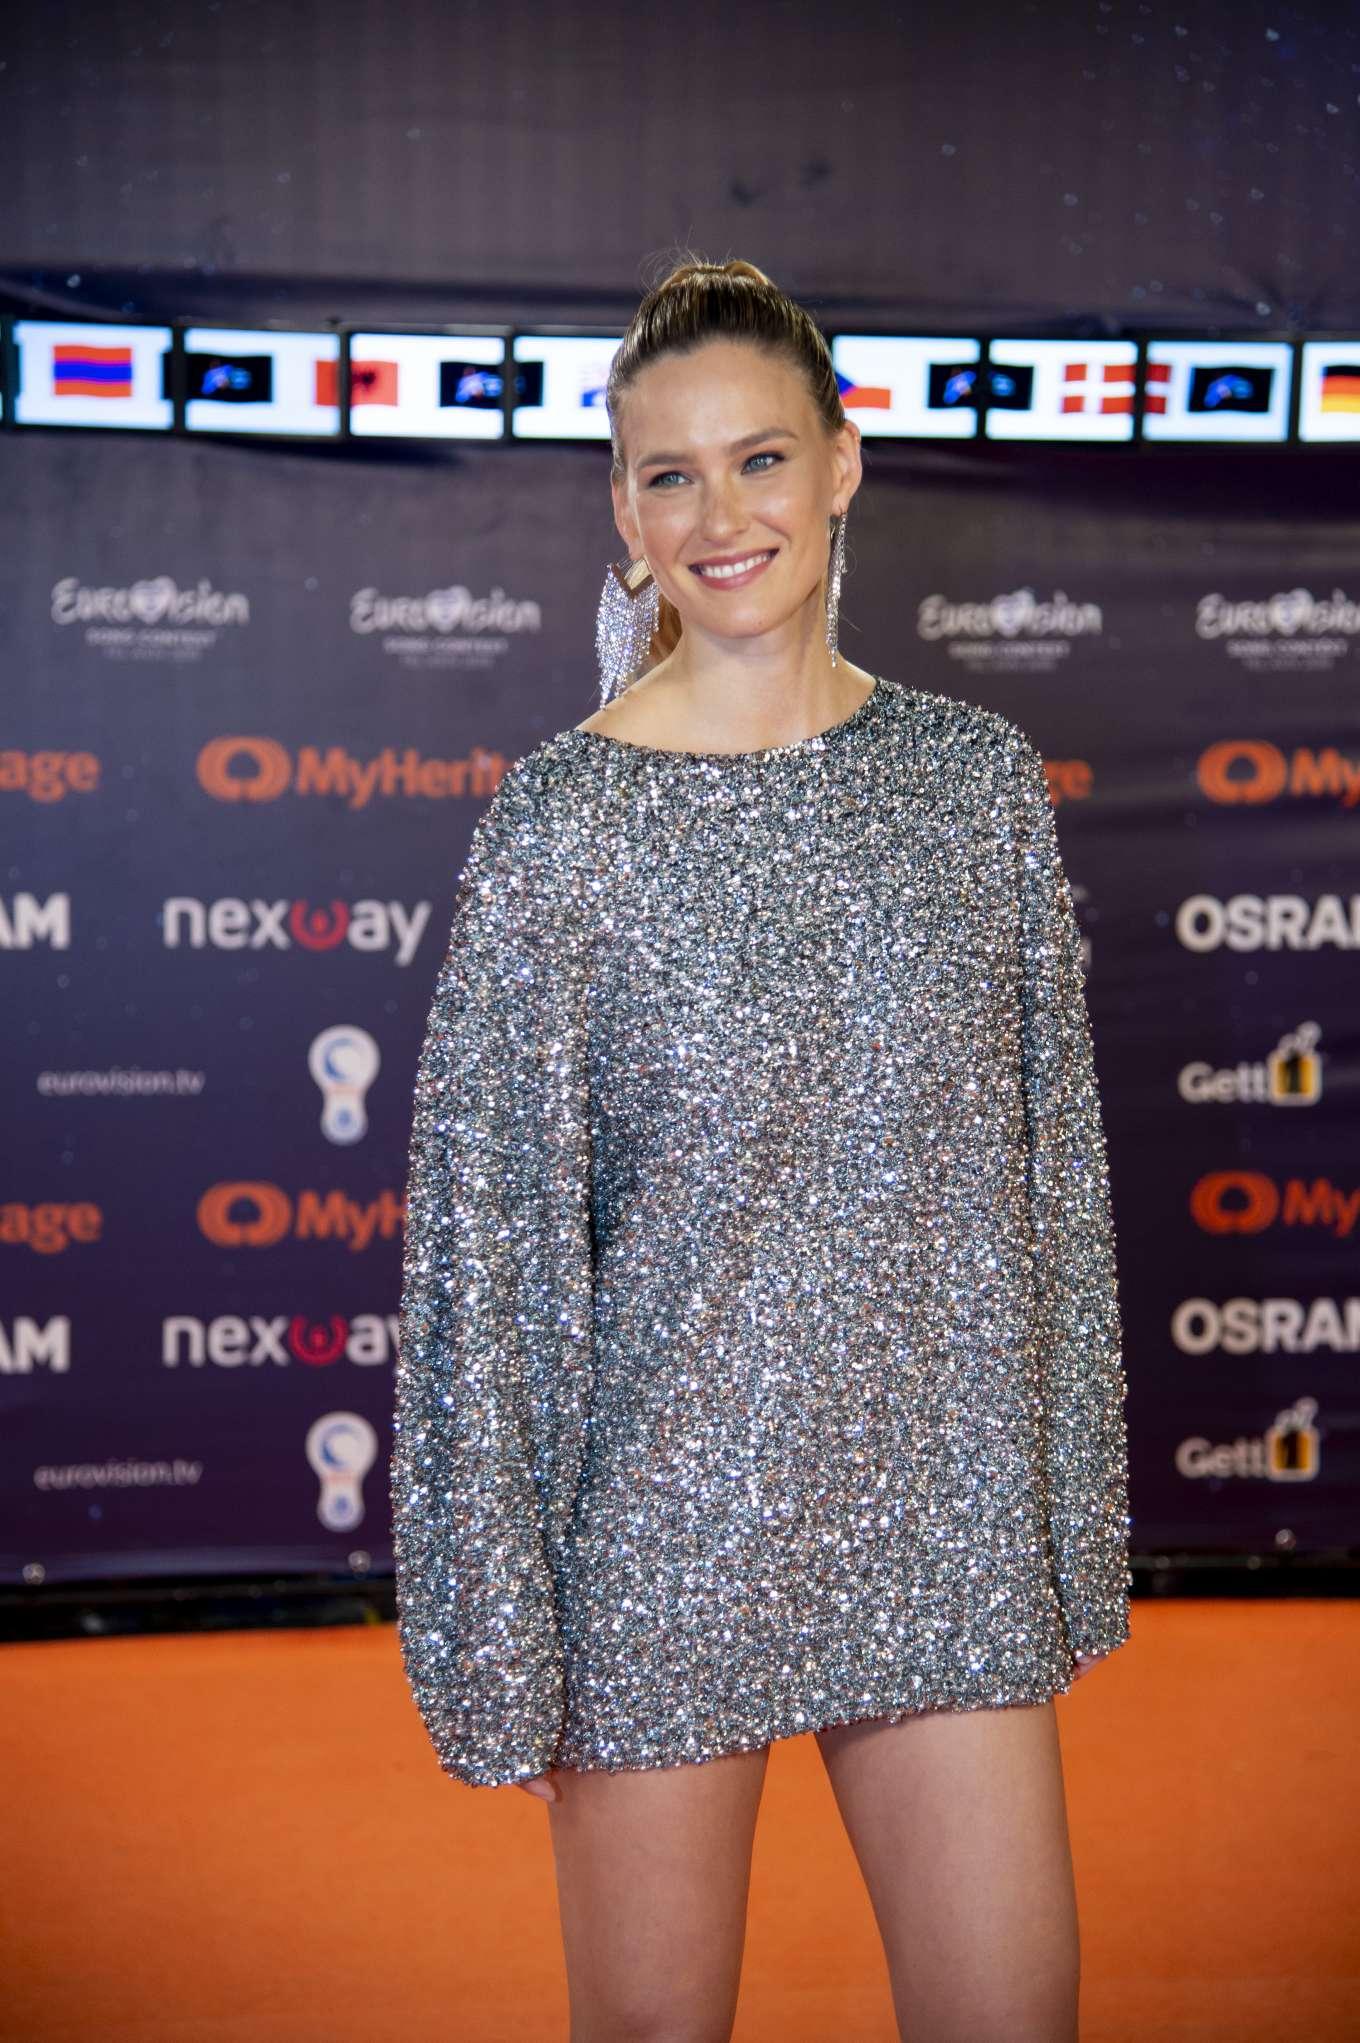 Bar Refaeli - 2019 Eurovision Song Contest Opening Ceremony in Tel Aviv